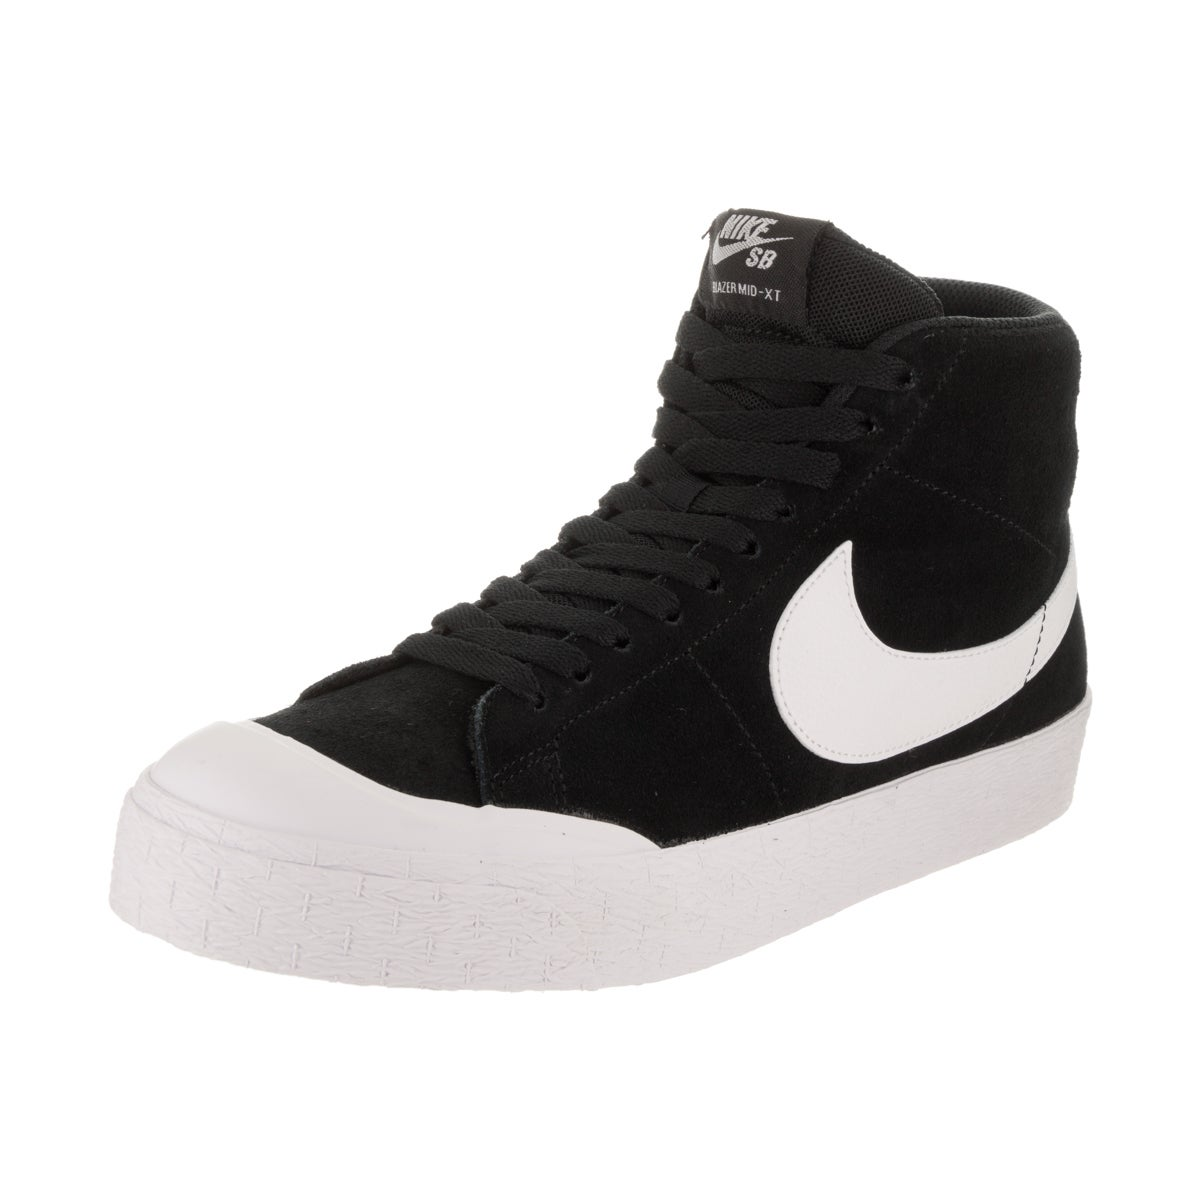 Nike Men's SB Blazer Zoom Mid XT Black Suede Skate Shoe